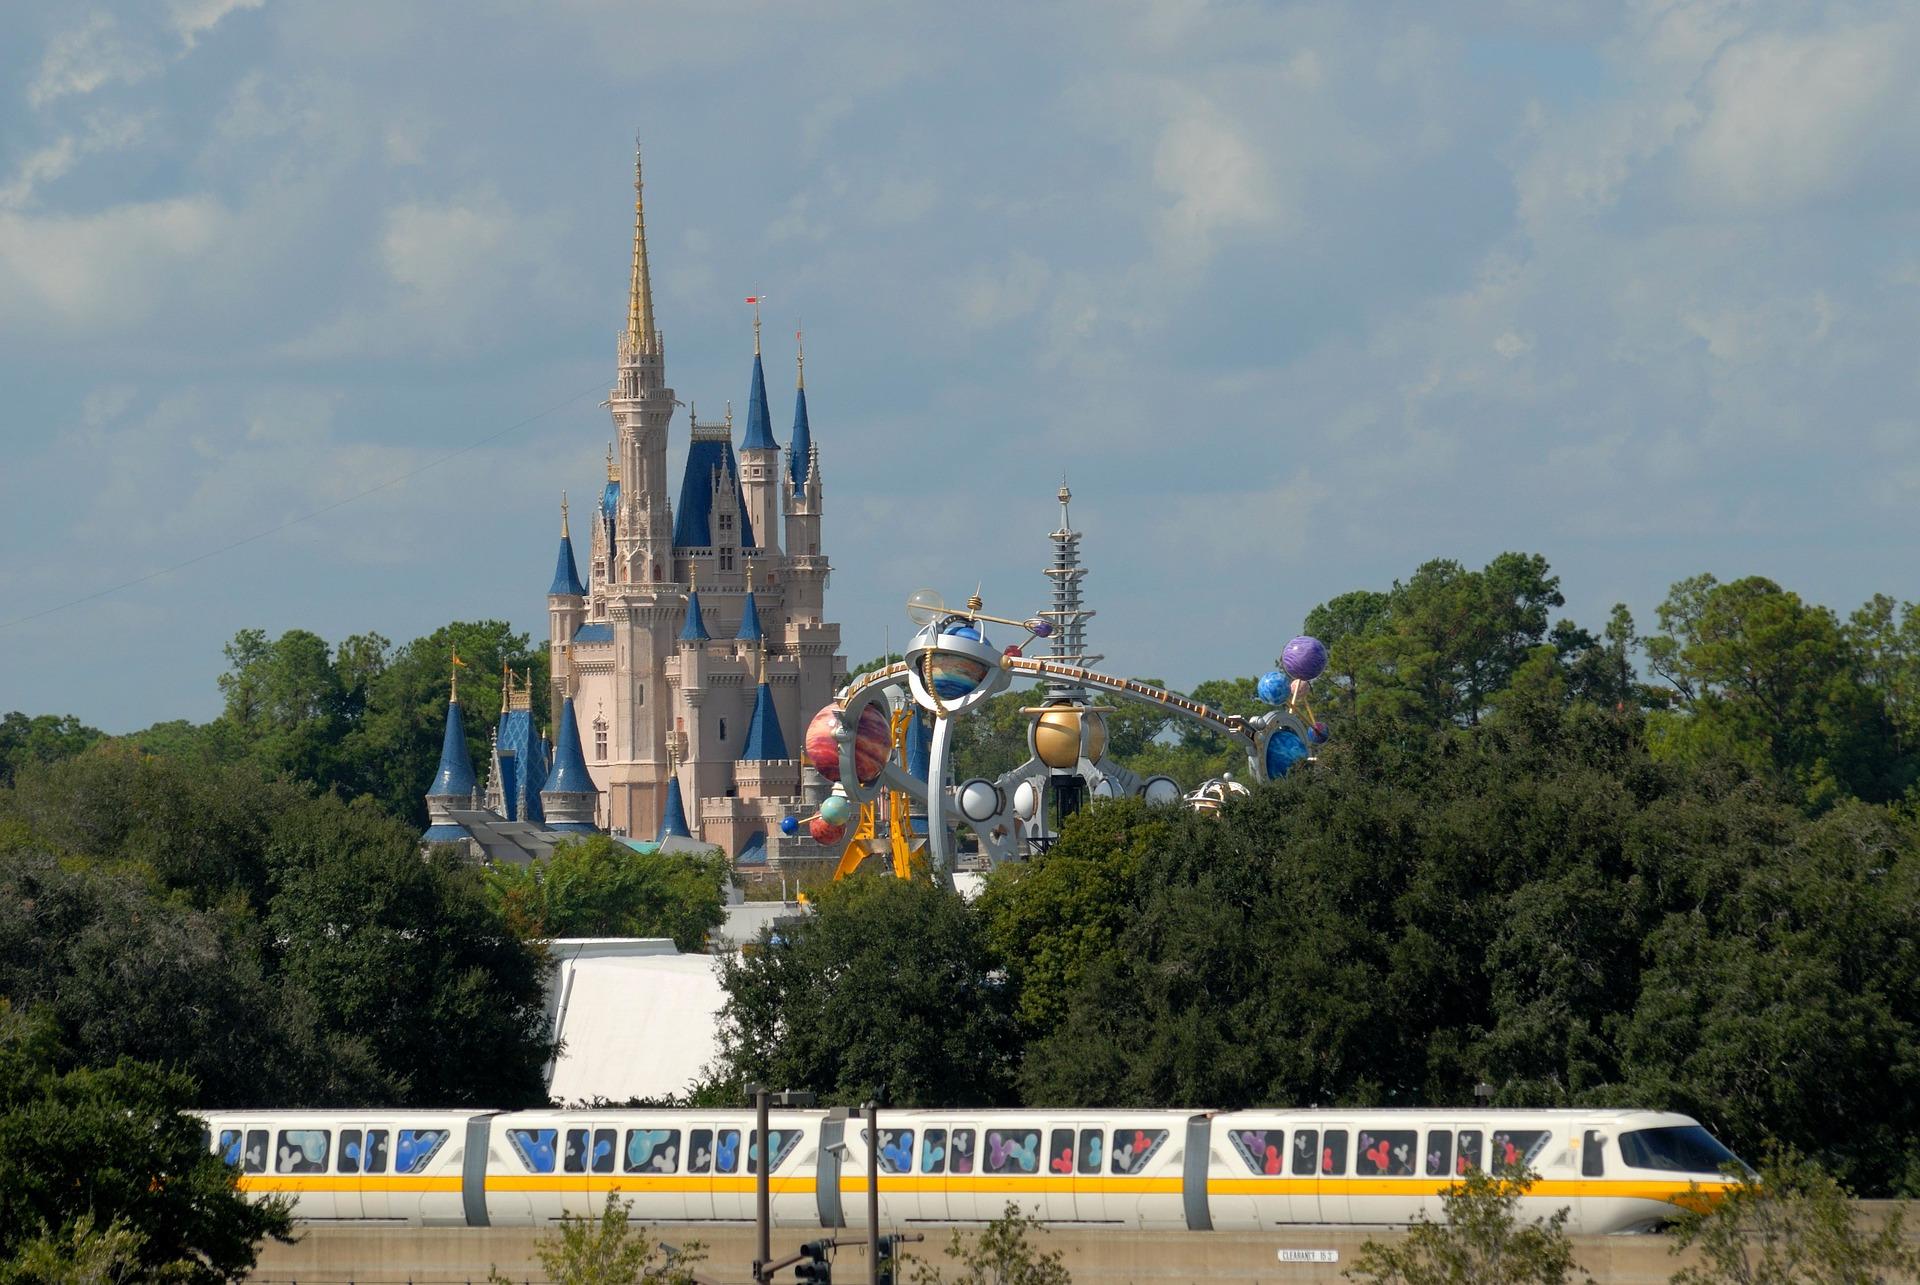 Train at Walt Disney World